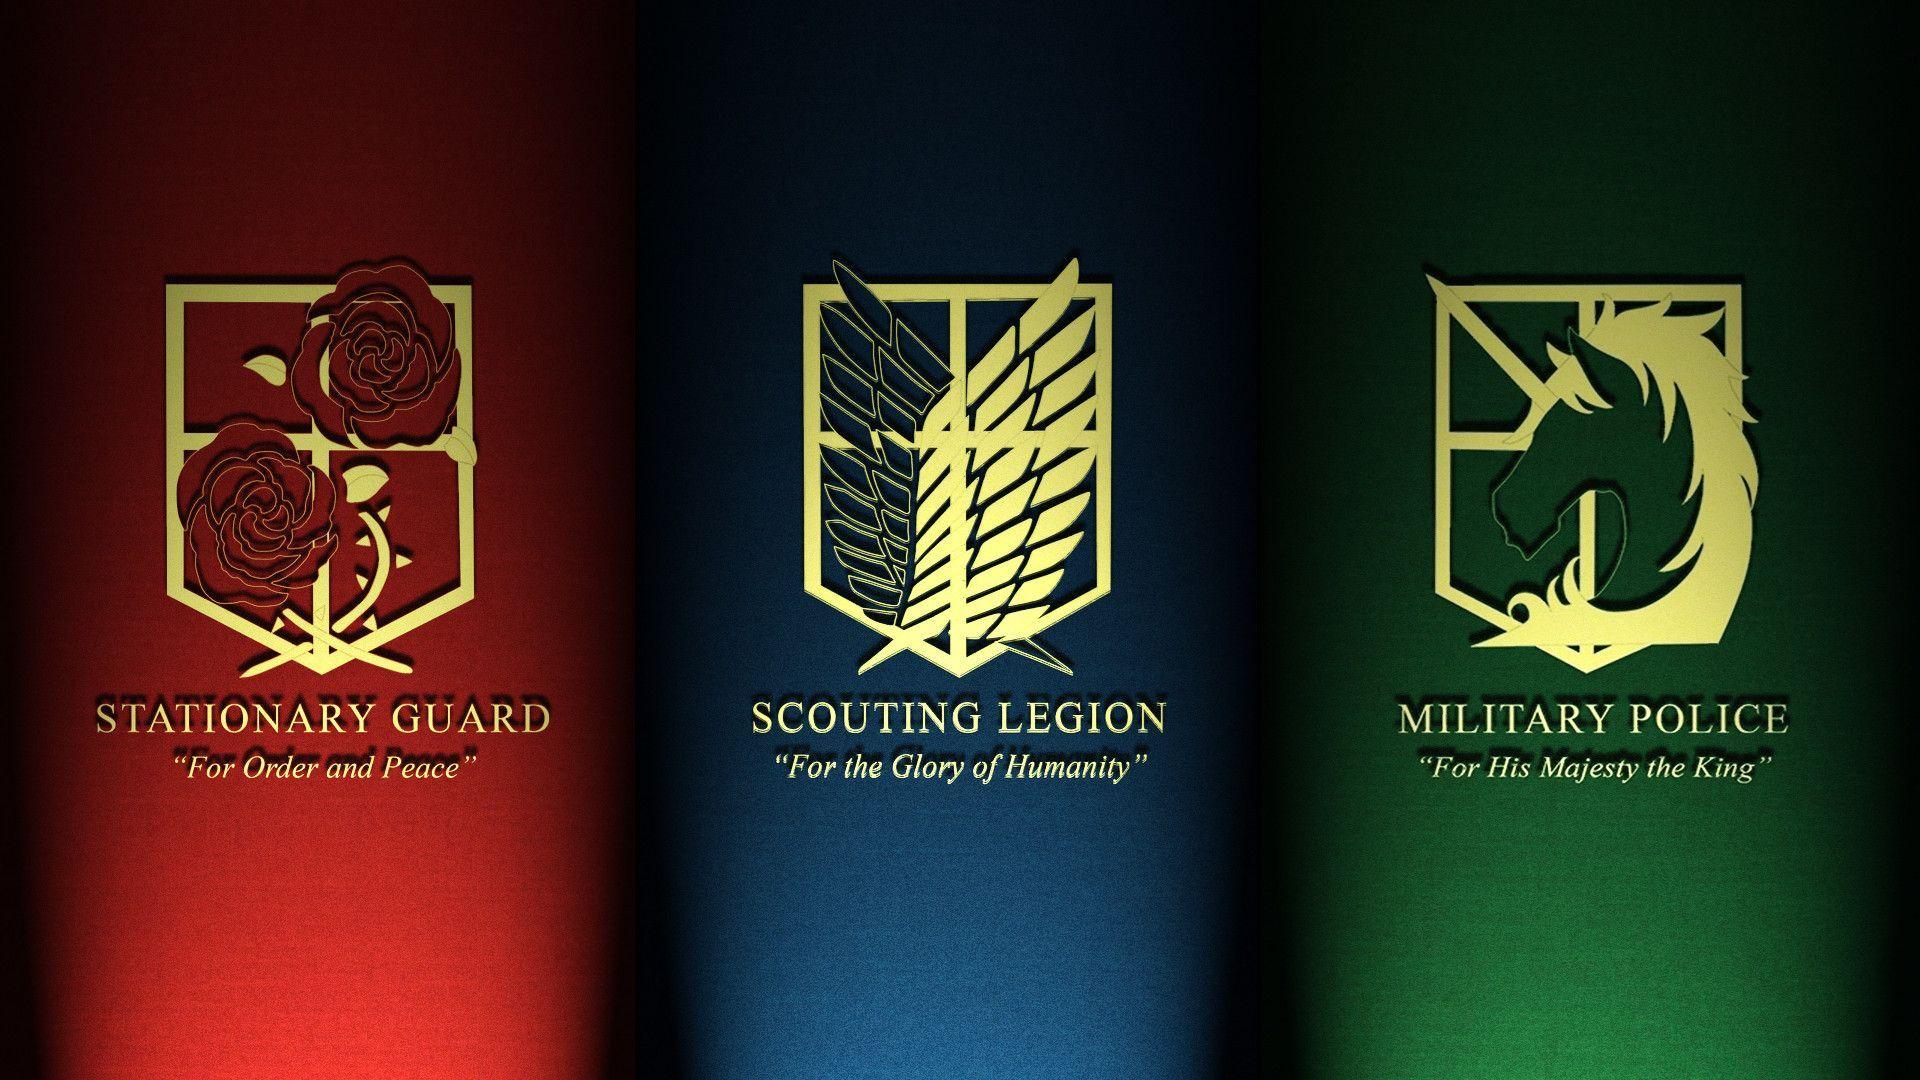 Attack On Titan Logo Wallpapers On Wallpaperdog